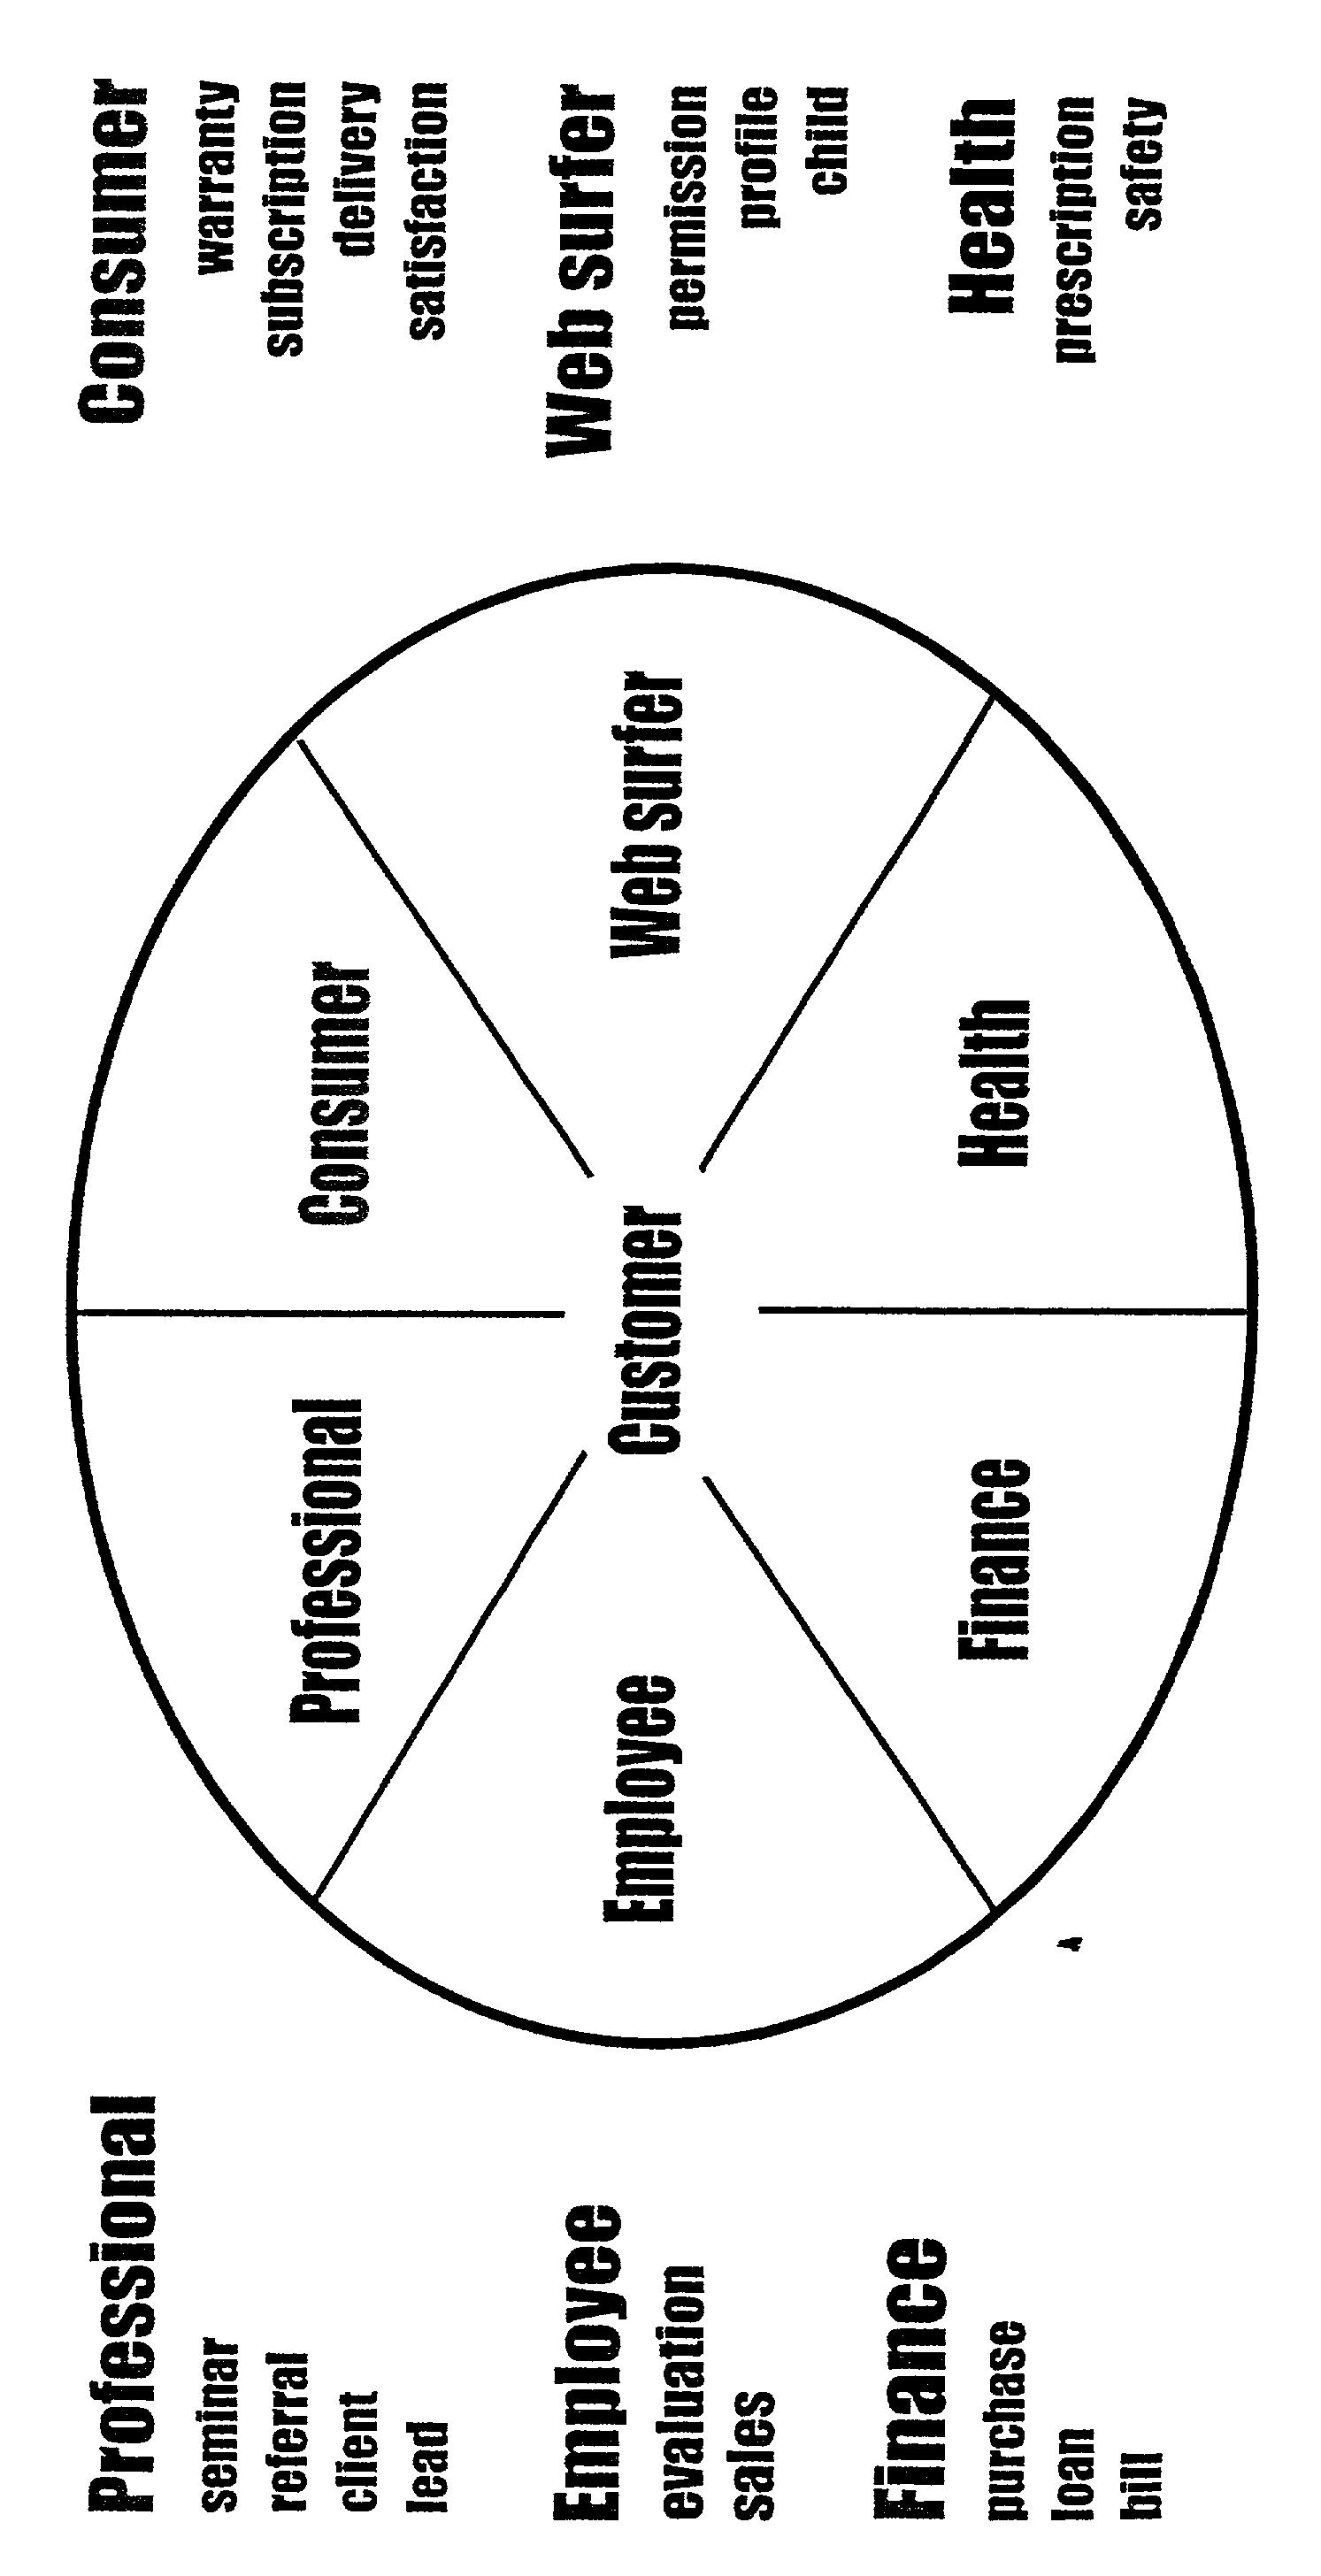 Figure US20020049907A1-20020425-P00045